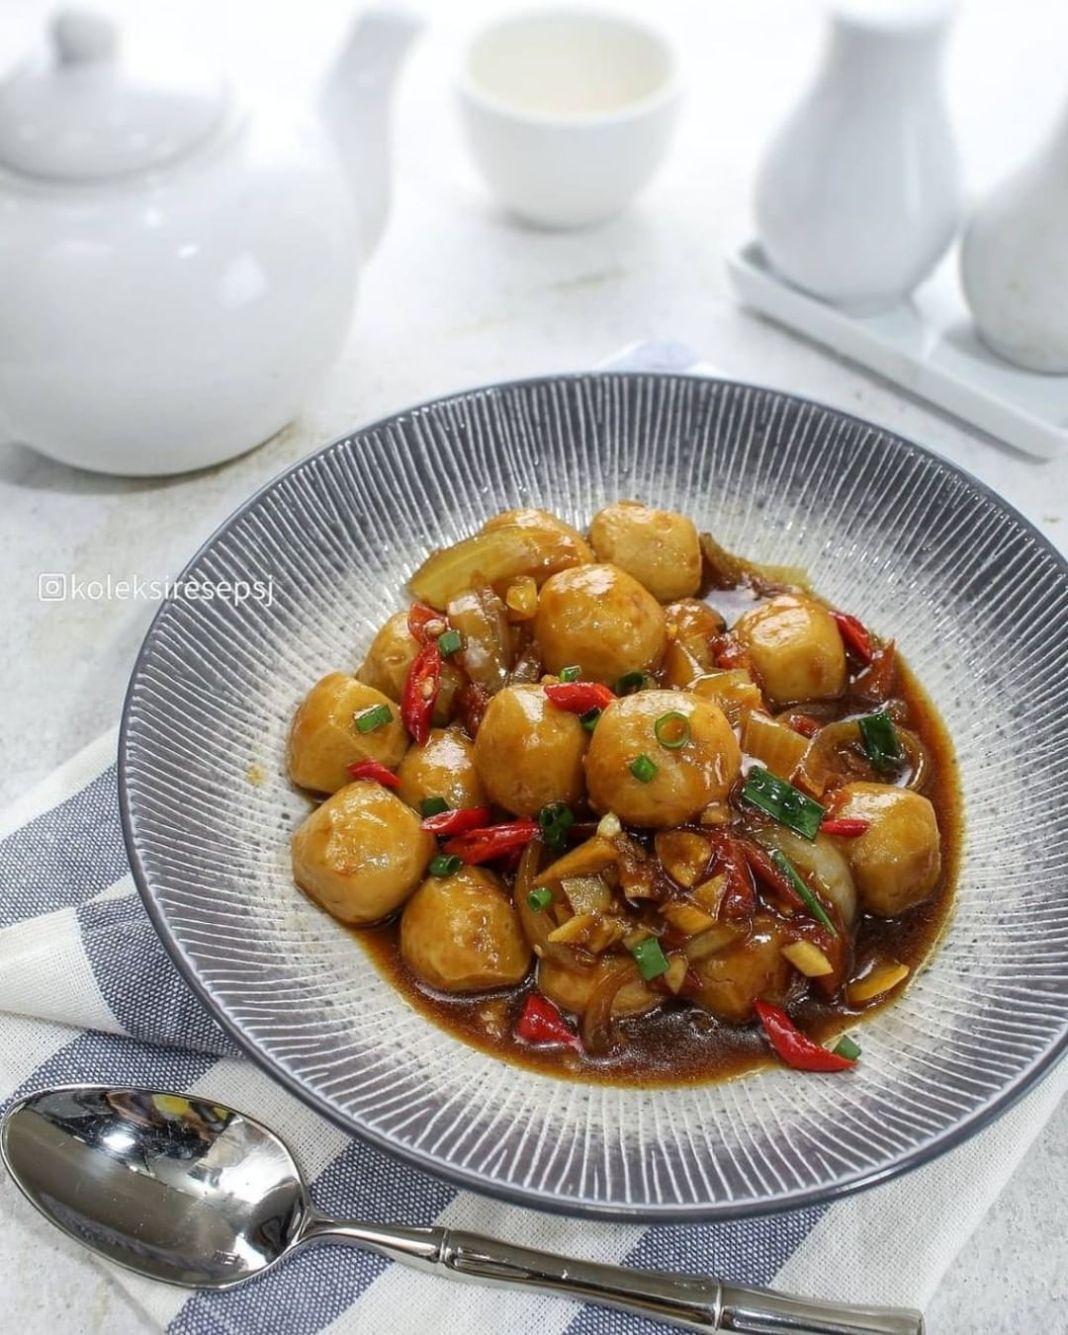 Info kuliner, TUMISAN BAKSO by@koleksiresepsj . Bahan: 1 SDM minyak goreng 2 butir bawang putih 1/2 bawang b…